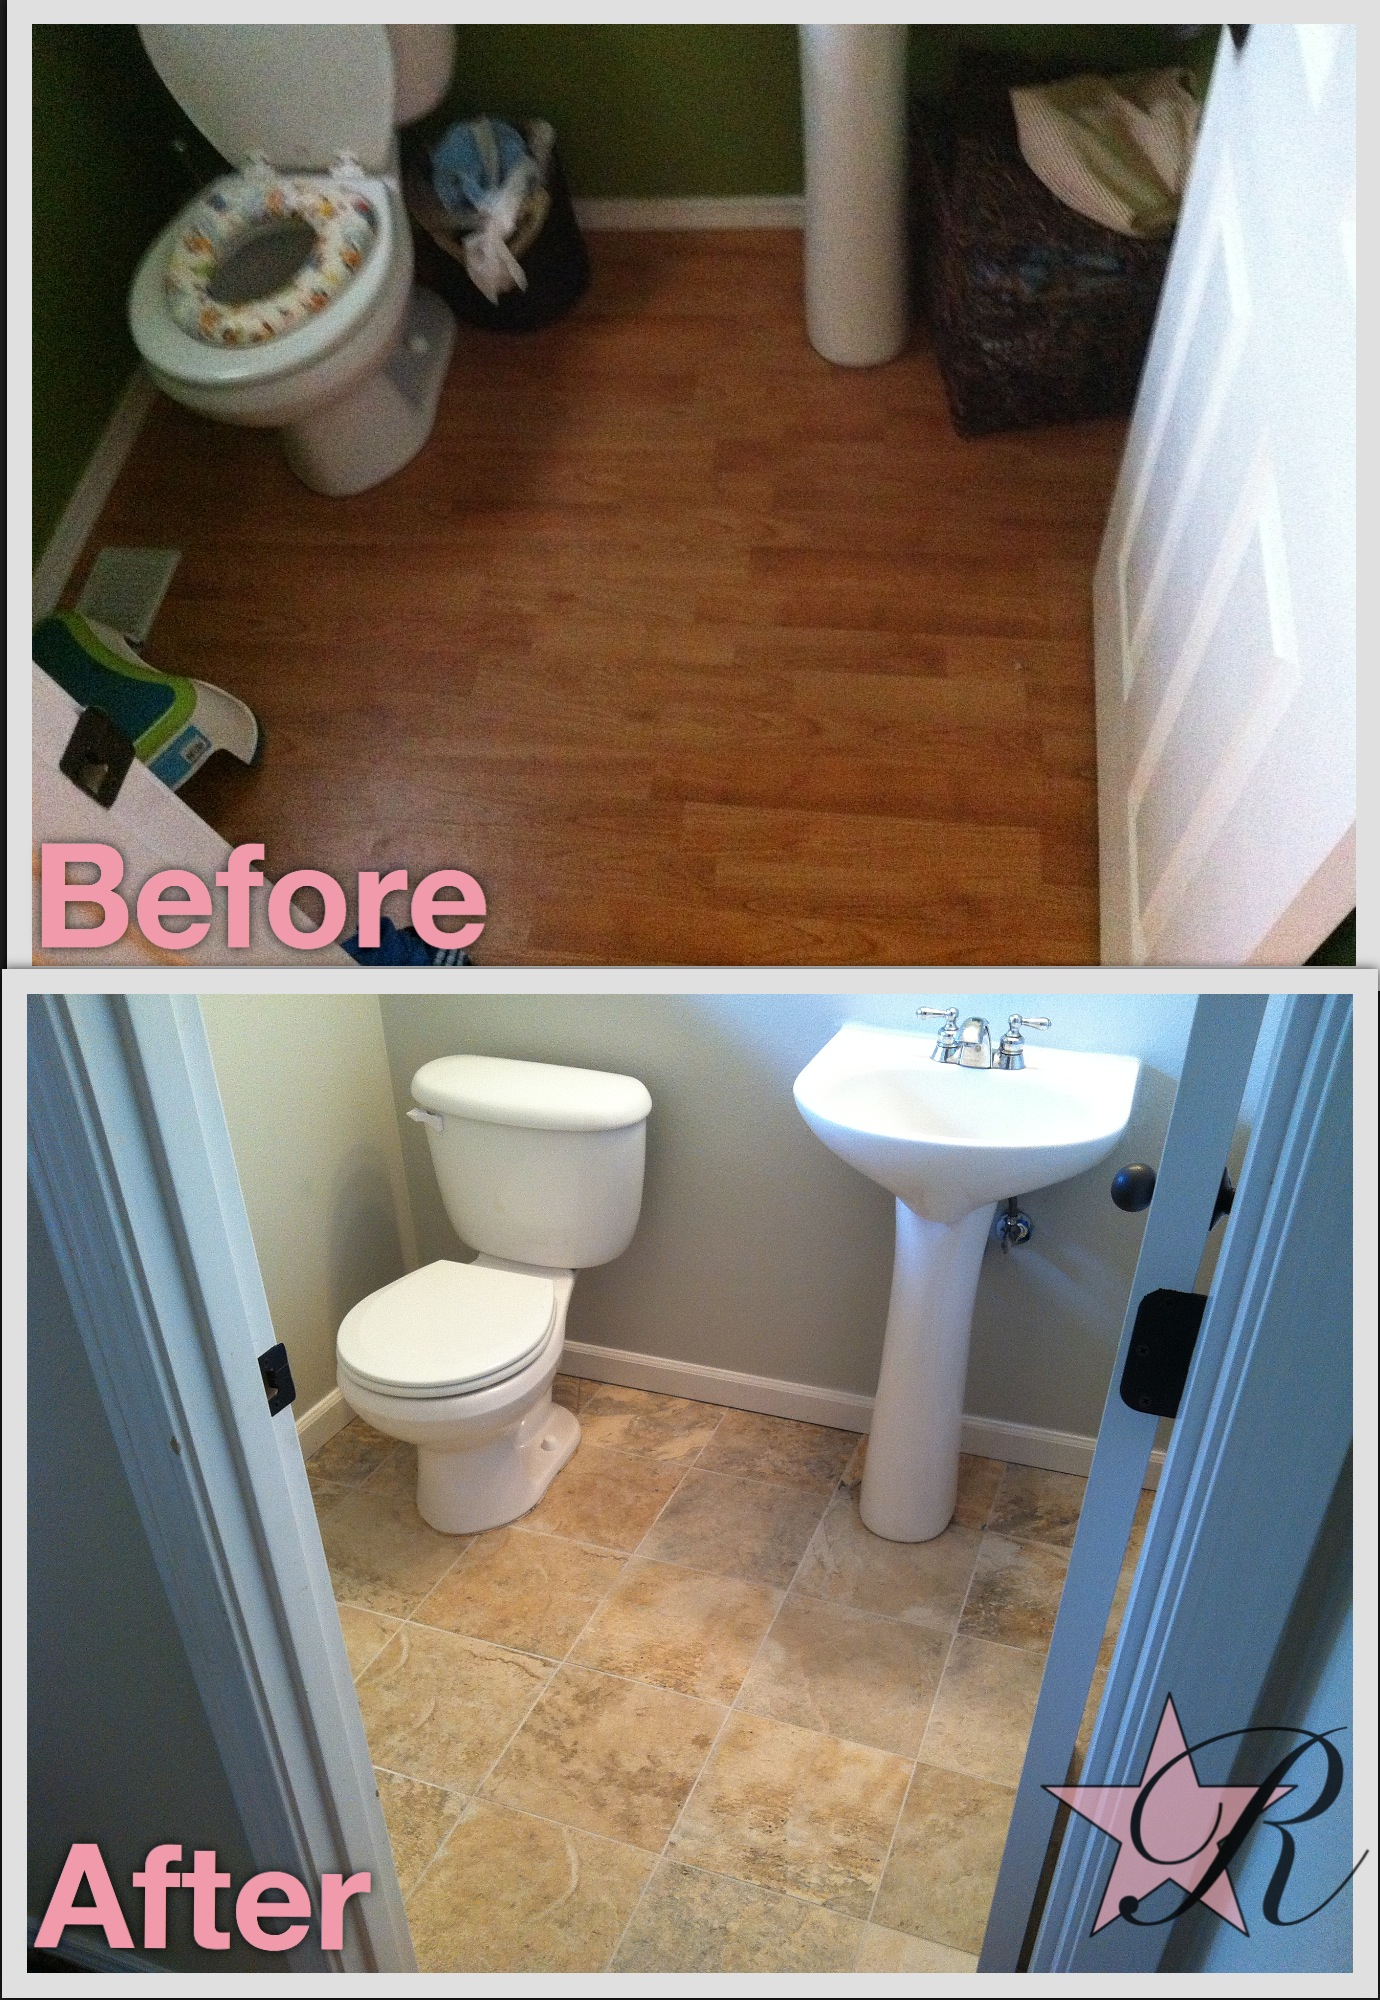 Rockstar Remodel installed a tile floor in this bathroom.